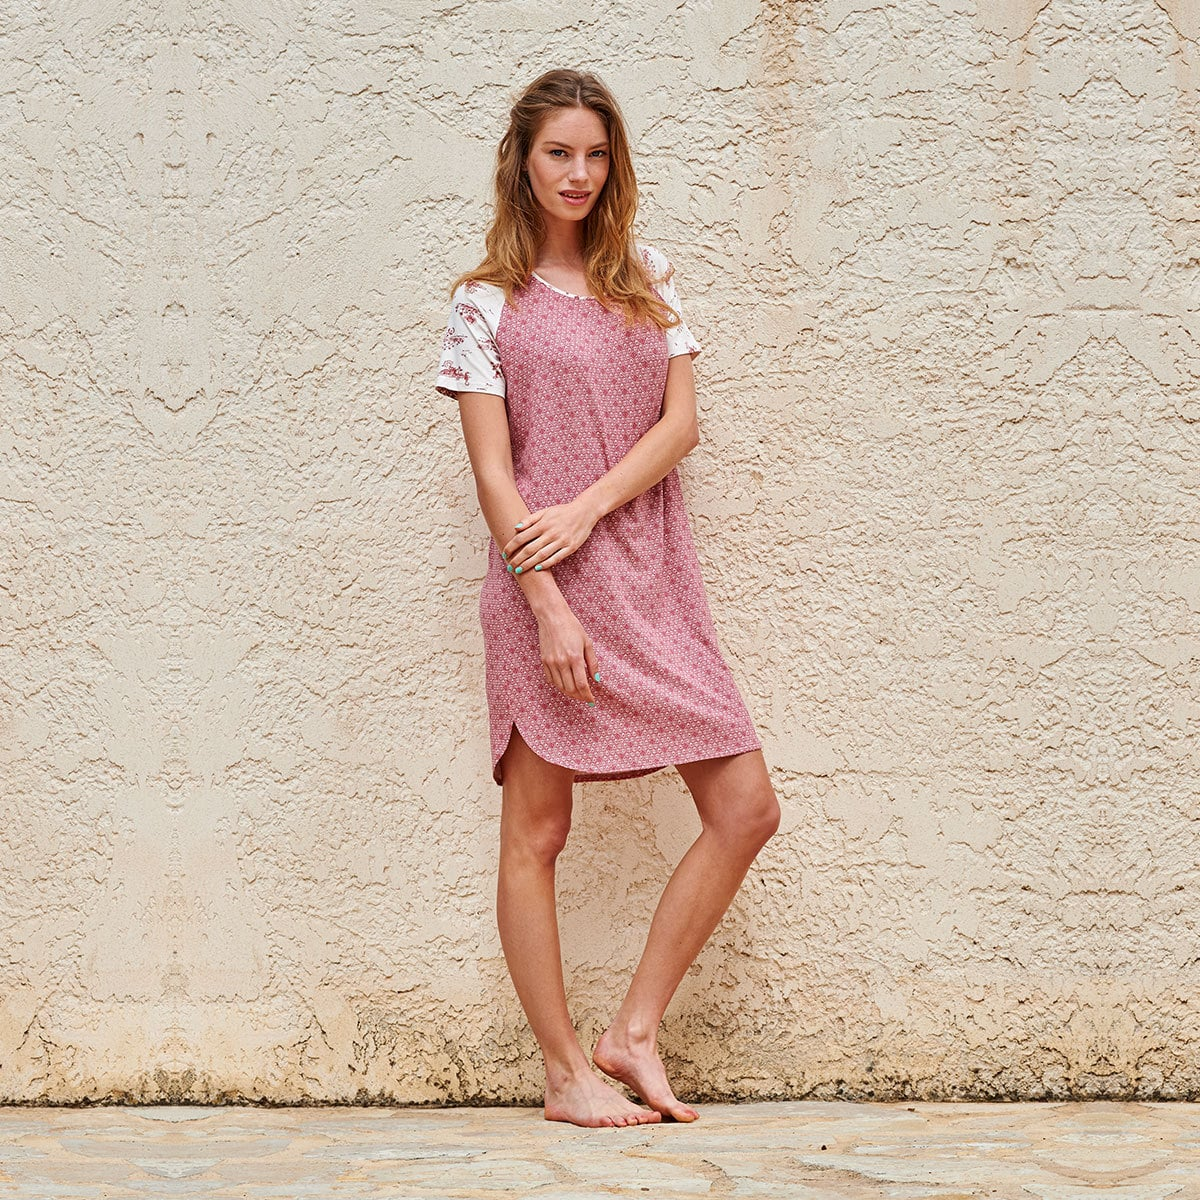 pip studio nachthemd dees leaves pink g nstig online kaufen bei bettwaren shop. Black Bedroom Furniture Sets. Home Design Ideas